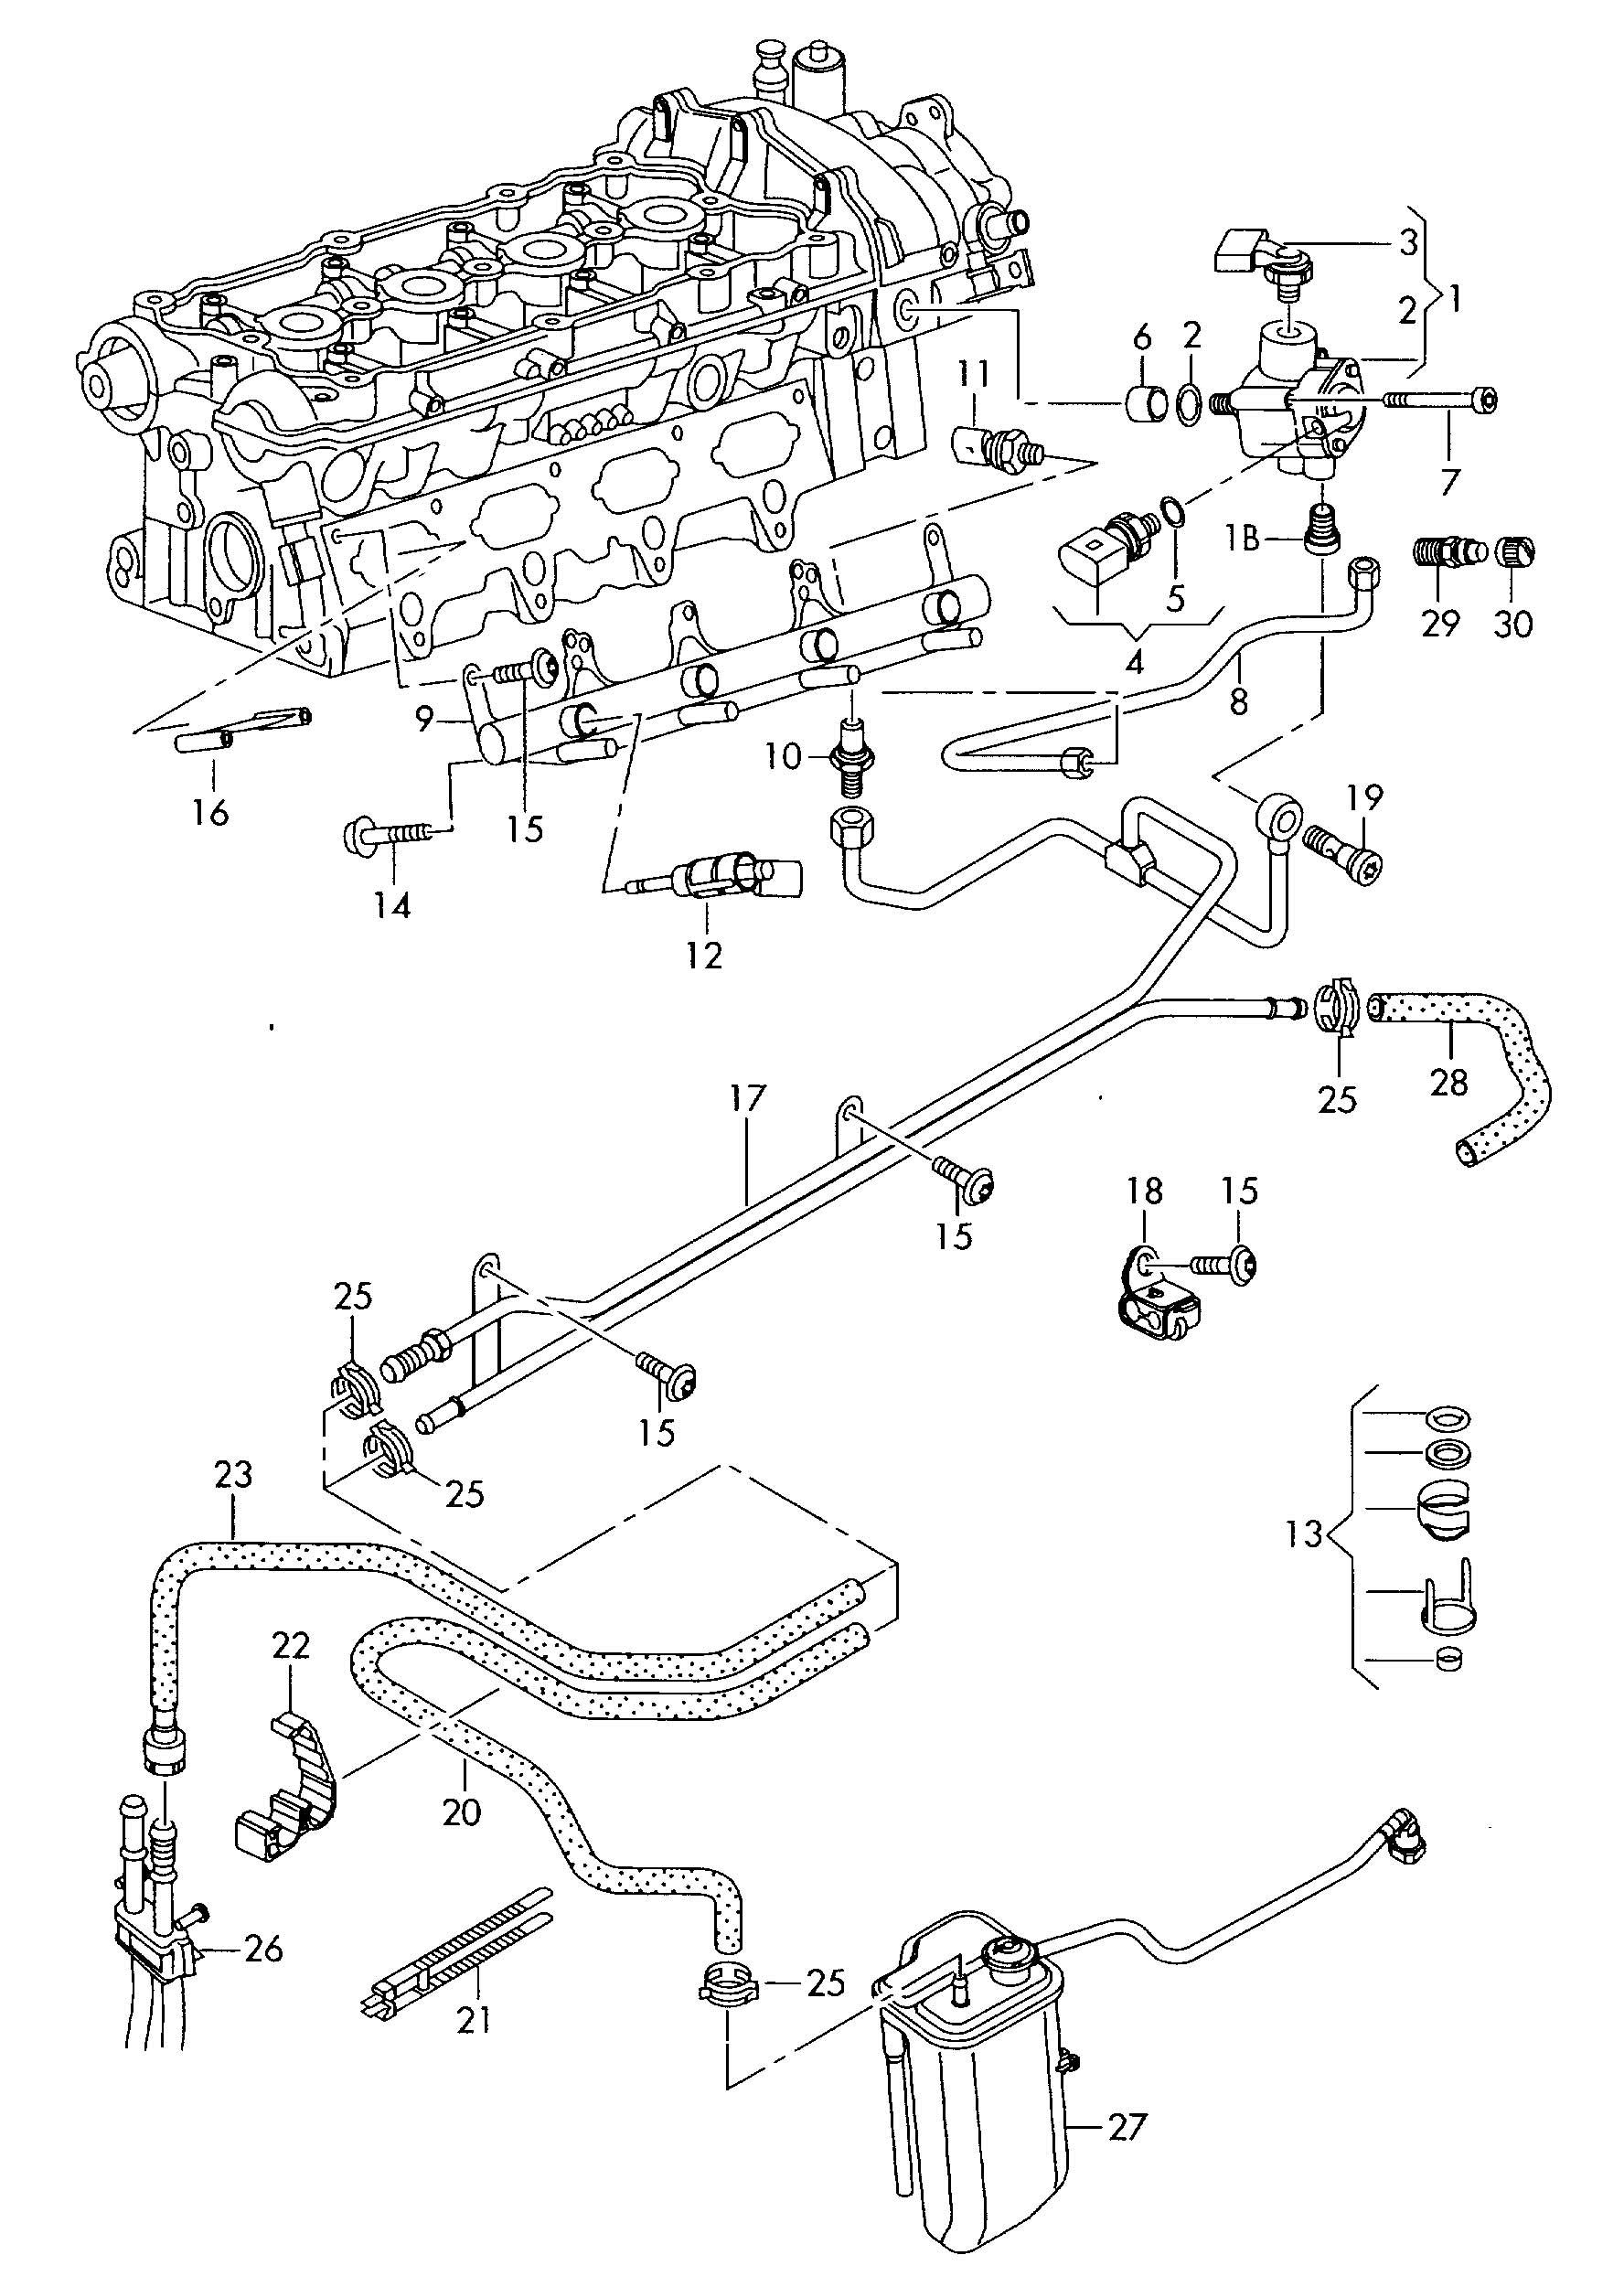 Volkswagen Passat Fuel Pump High Pressure Pump Fuel Rail